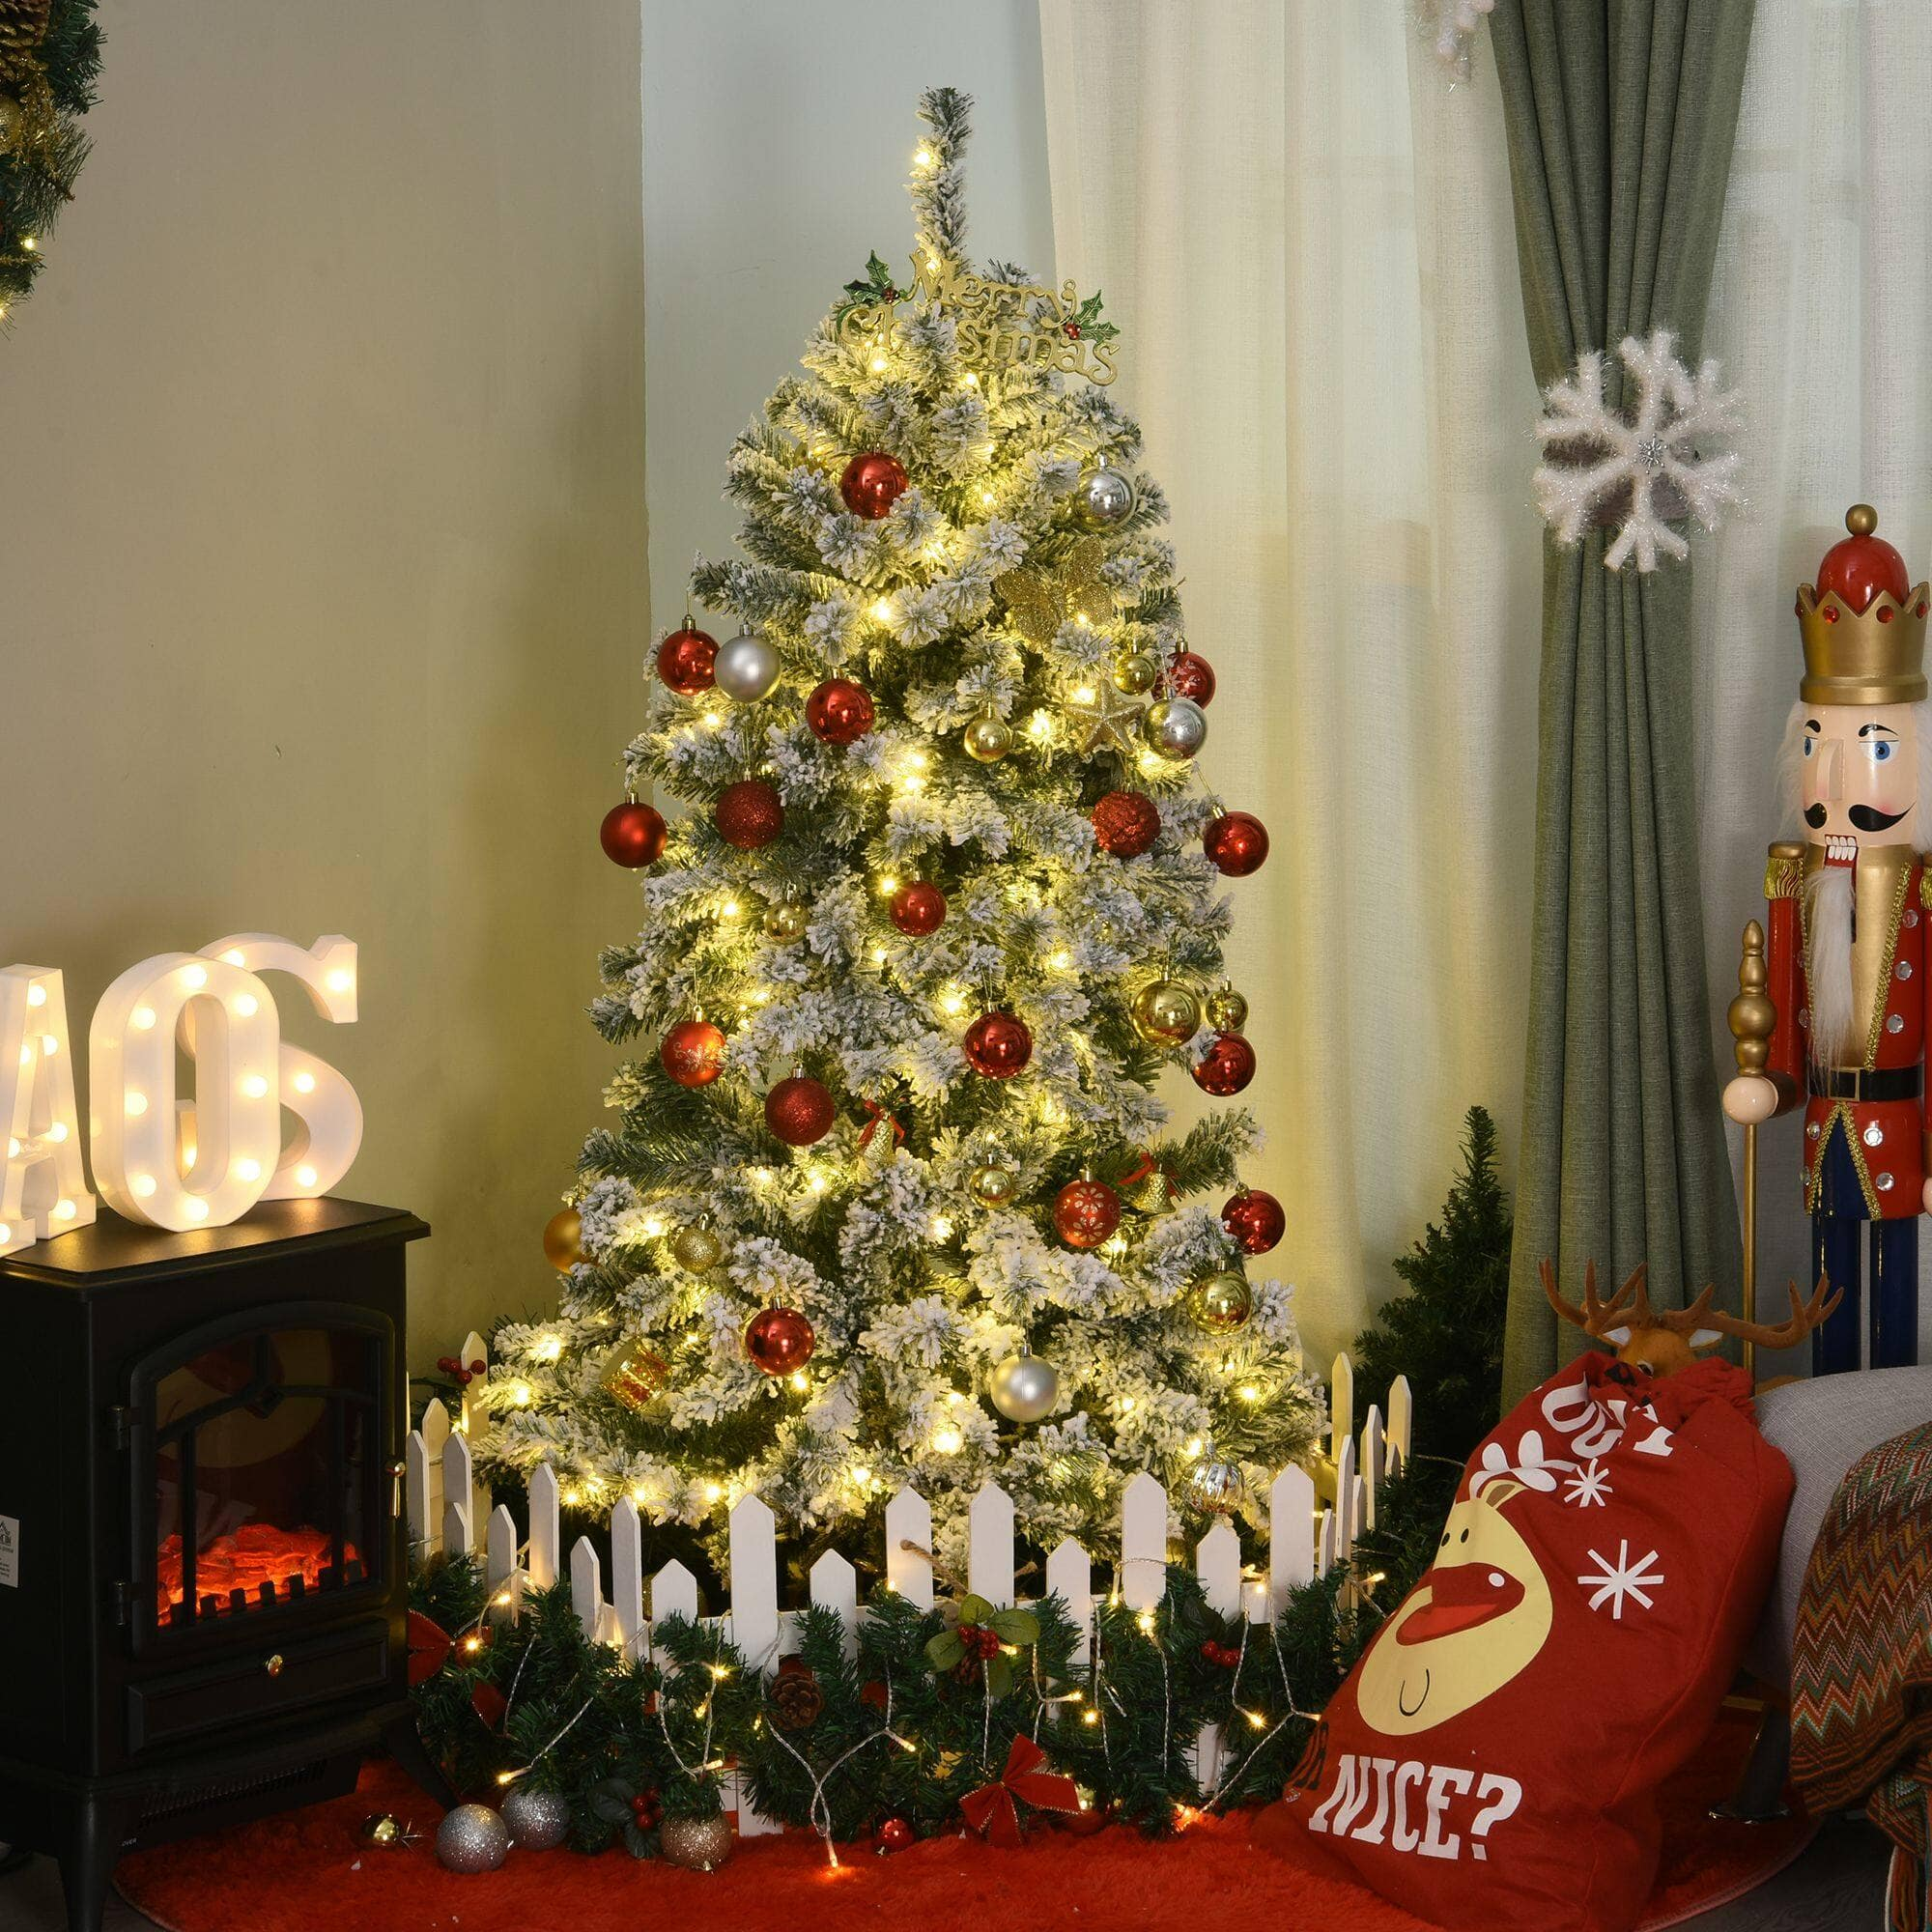 HOMCOM 4.5ft Snow Flocked Fake Christmas Tree w/ 400 Branches $39.99 + Free Shipping